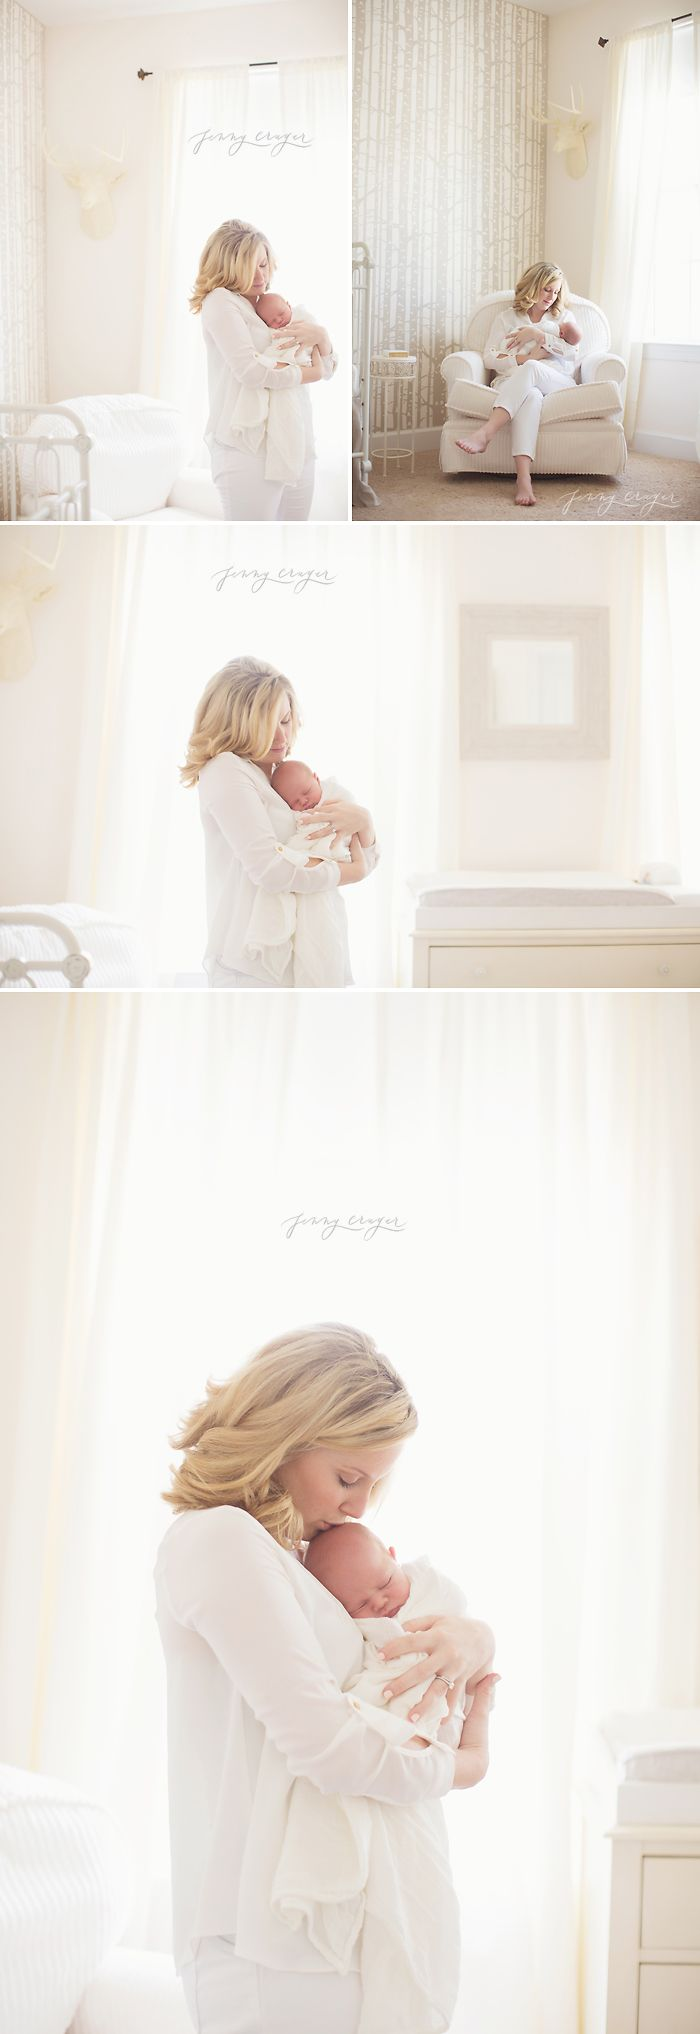 newborn photographer nashville . beckett's newborn session jenny cruger photography